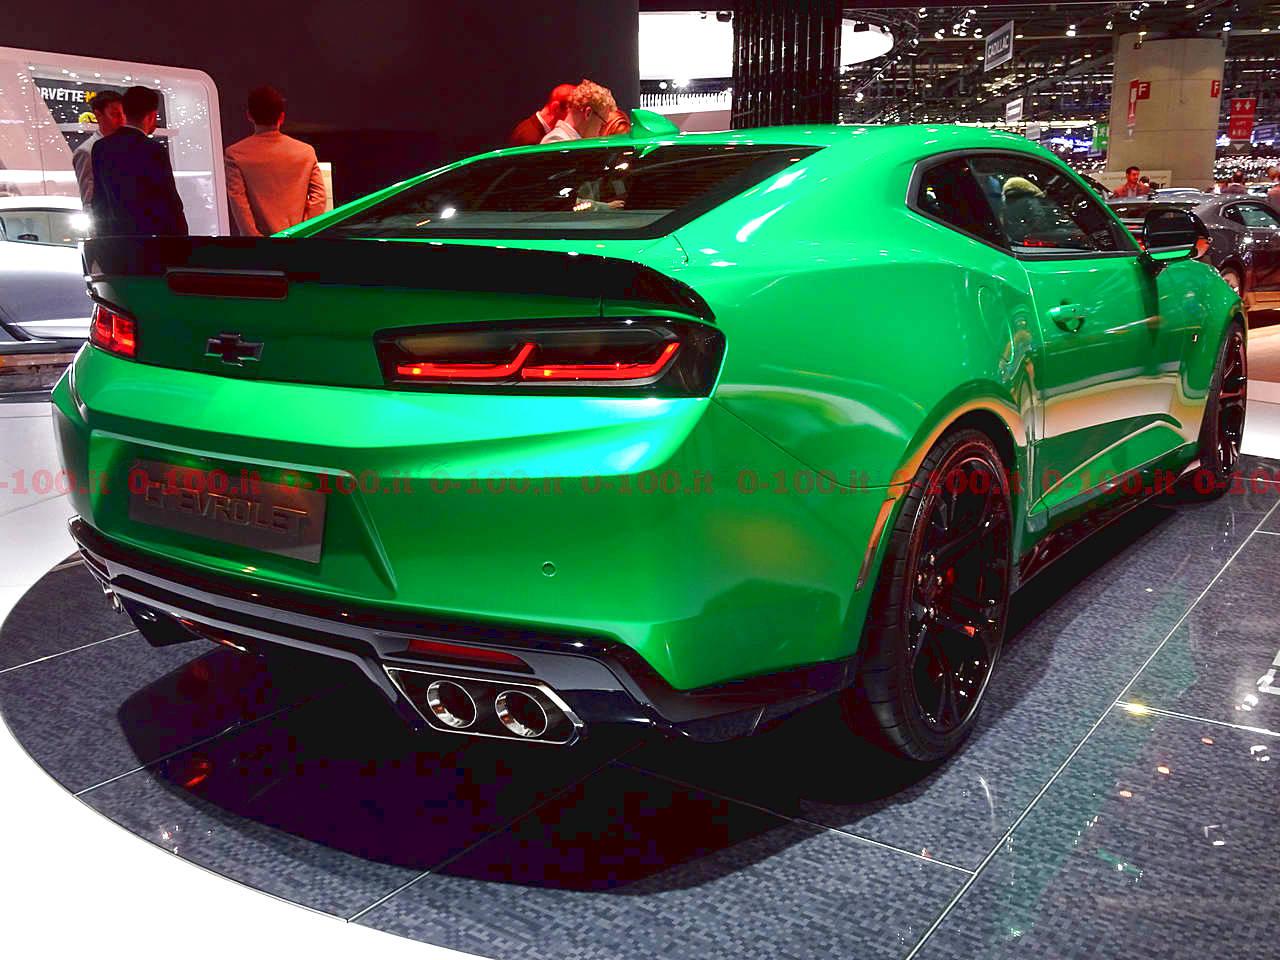 Ginevra-geneva-geneve-2017-Chevrolet-Camaro-Track-Concept-0-100_12